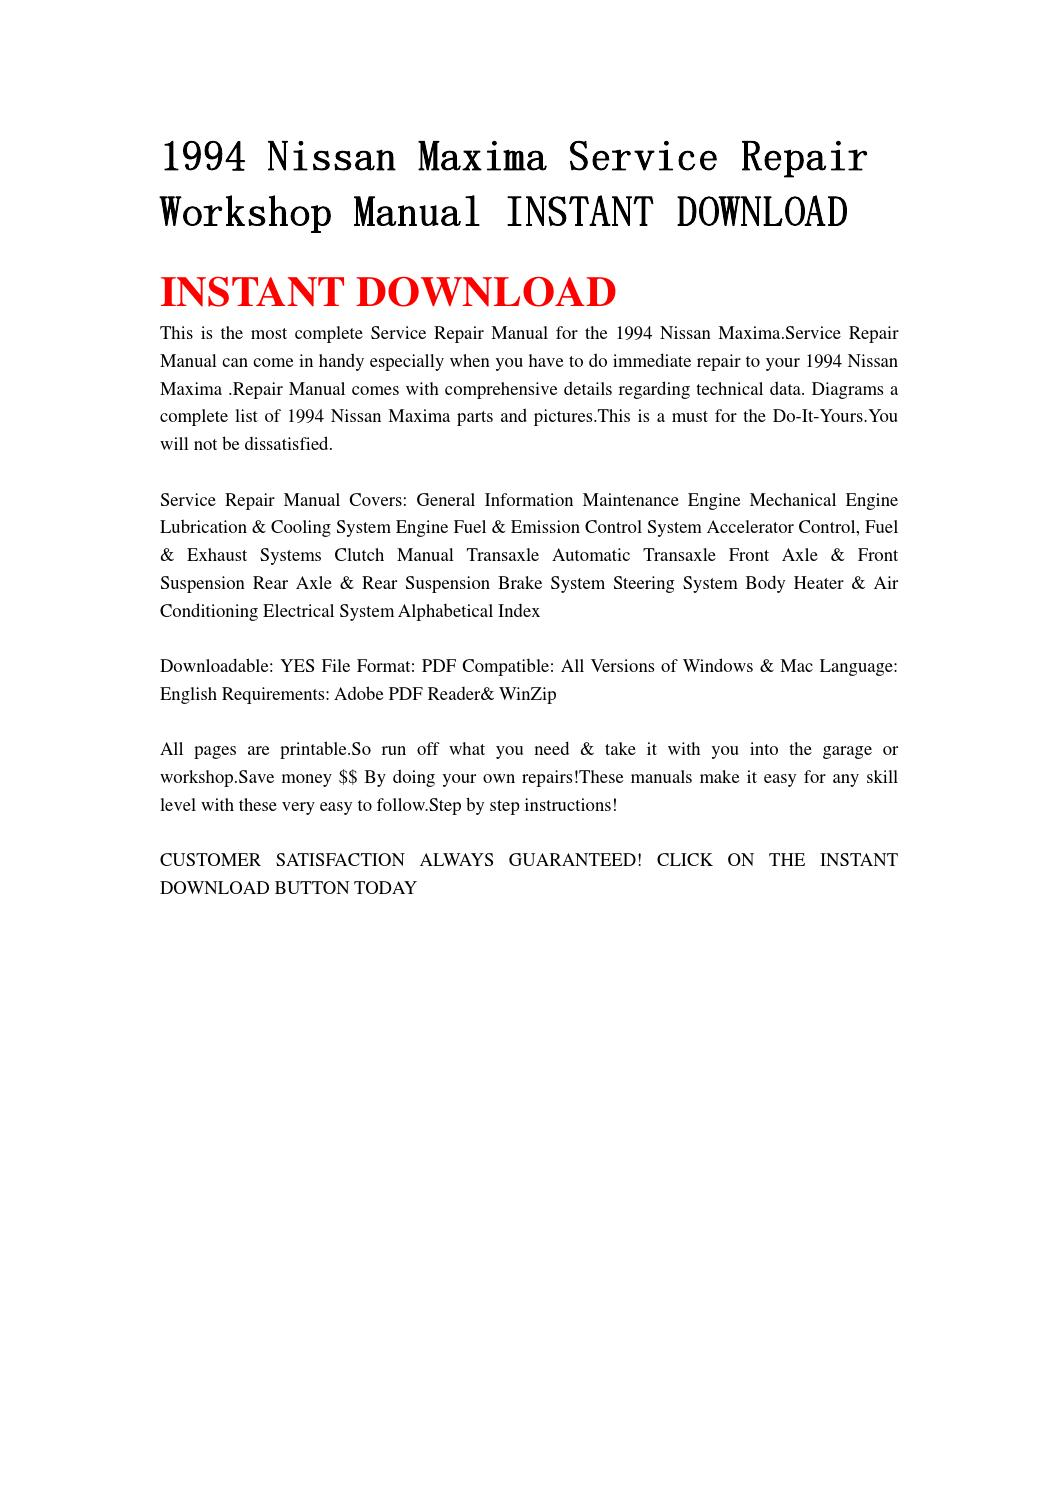 1994 nissan maxima service repair workshop manual instant download by  djhsenfnn - issuu